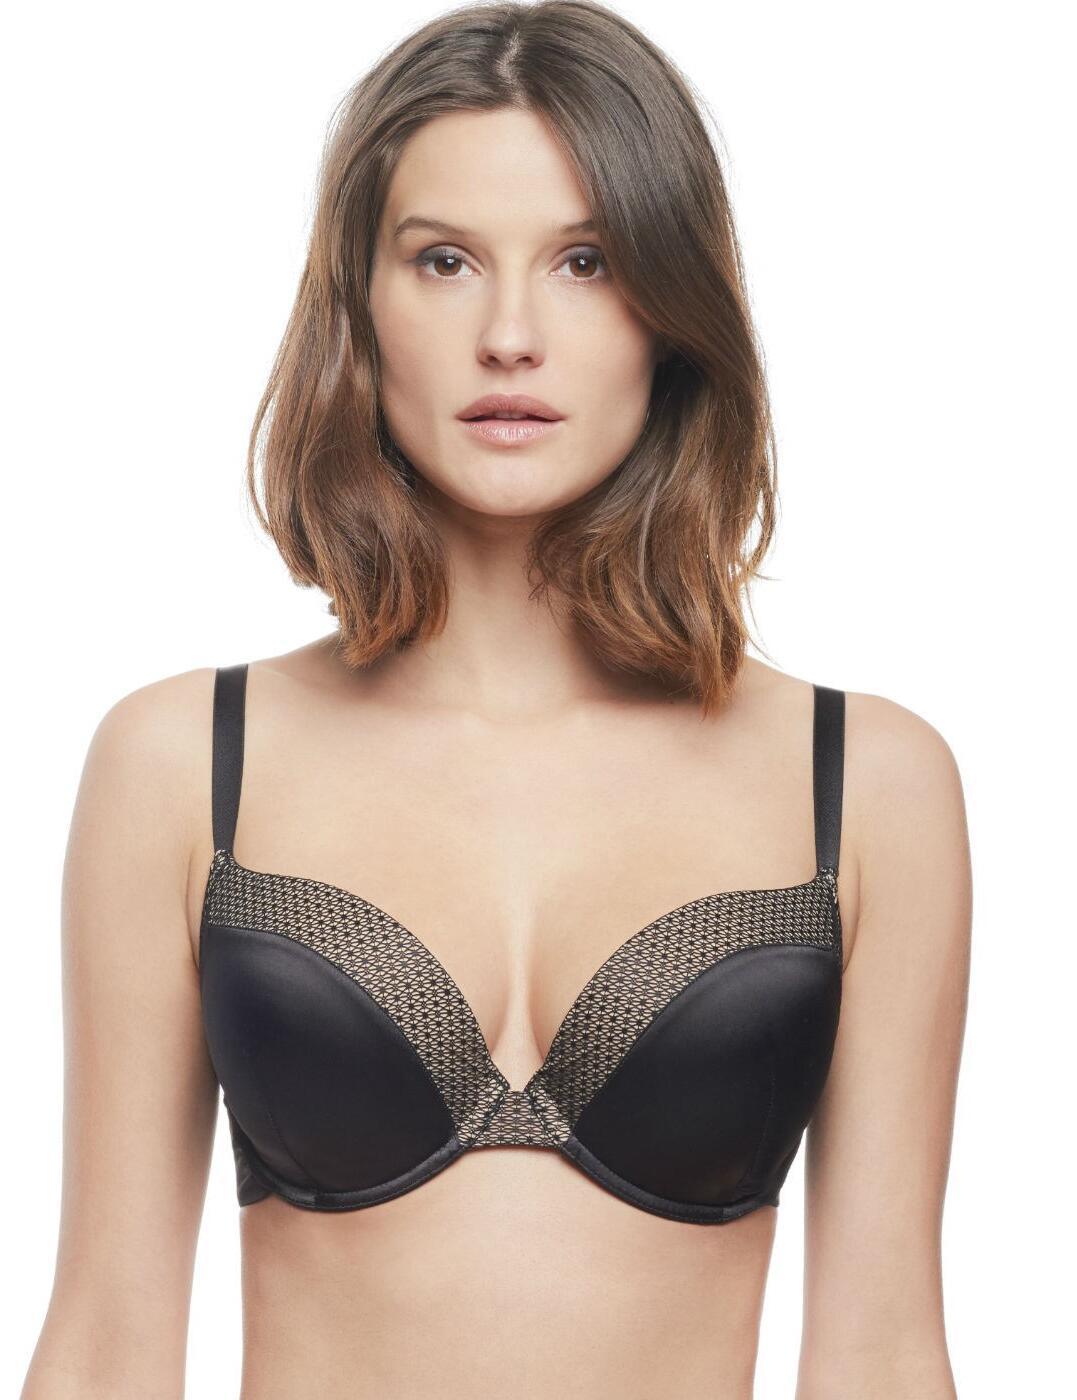 Panache Zara 5084 Black or Nude Short Sizes 10-18